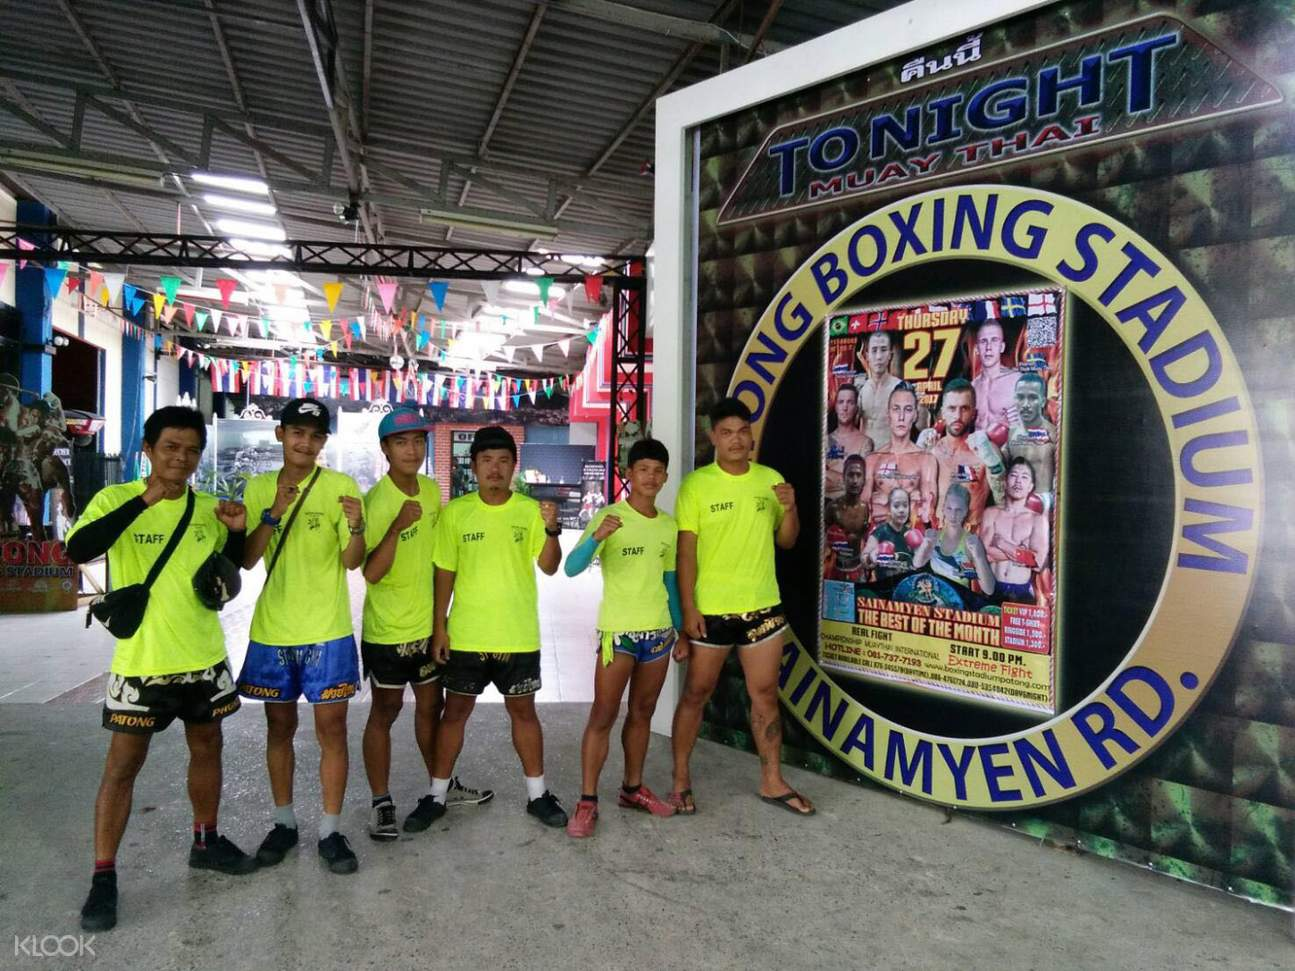 patong boxing stadium ticket